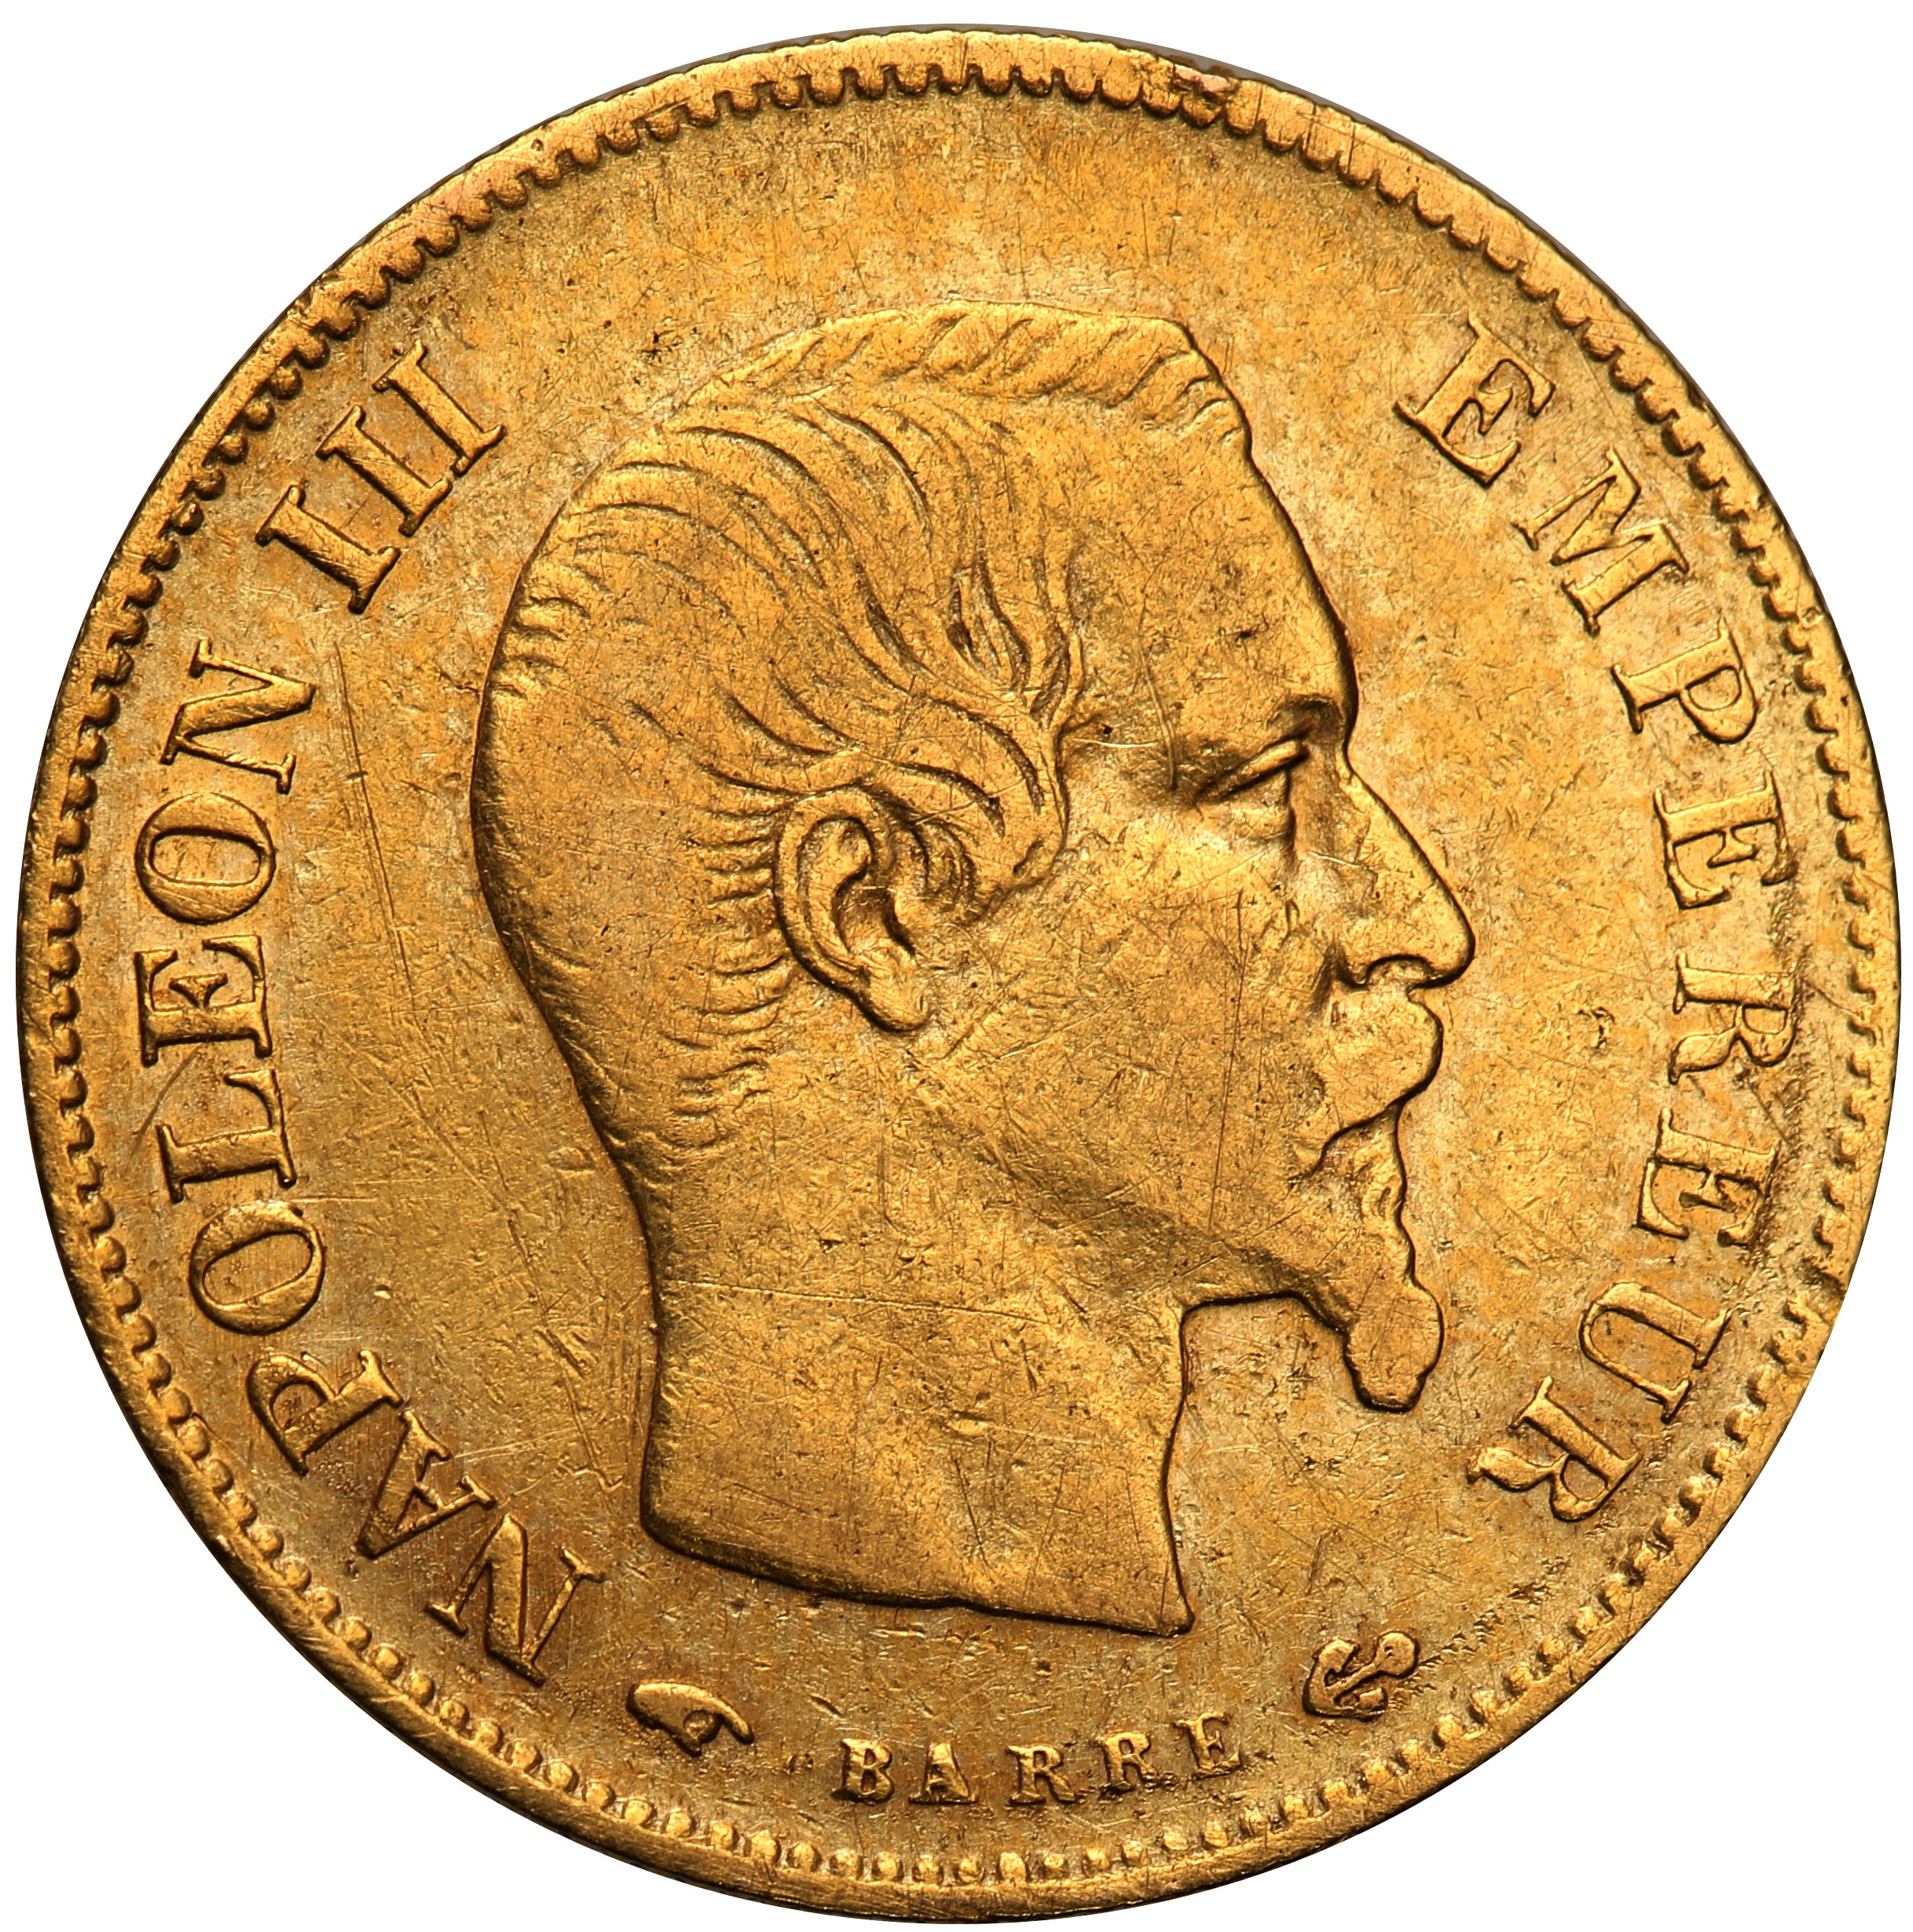 Francja. Napoleon III. 10 franków 1860 A st. 3+